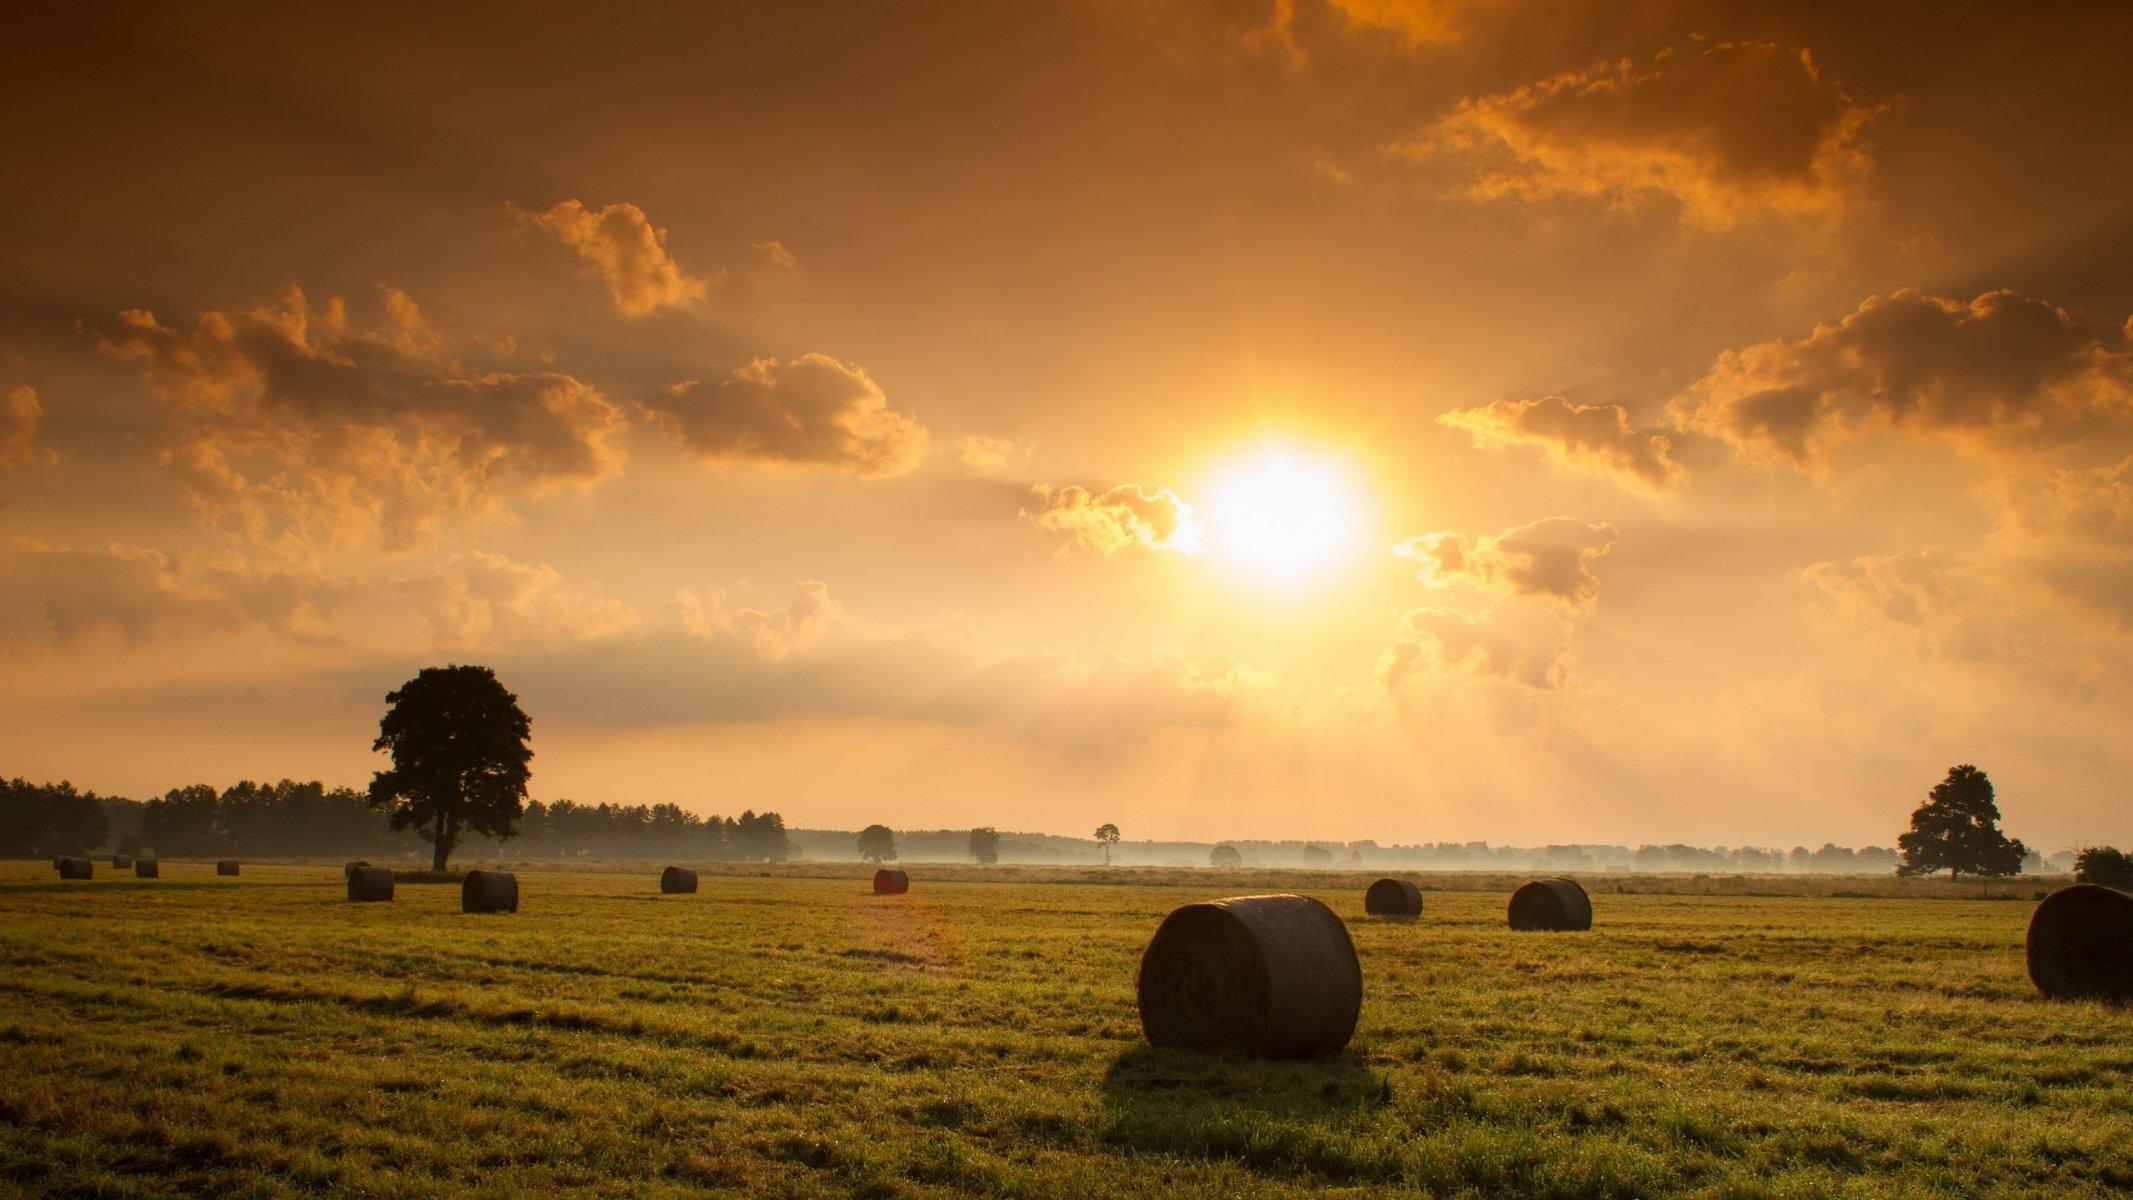 оранжевое авто дорога трава сено бесплатно